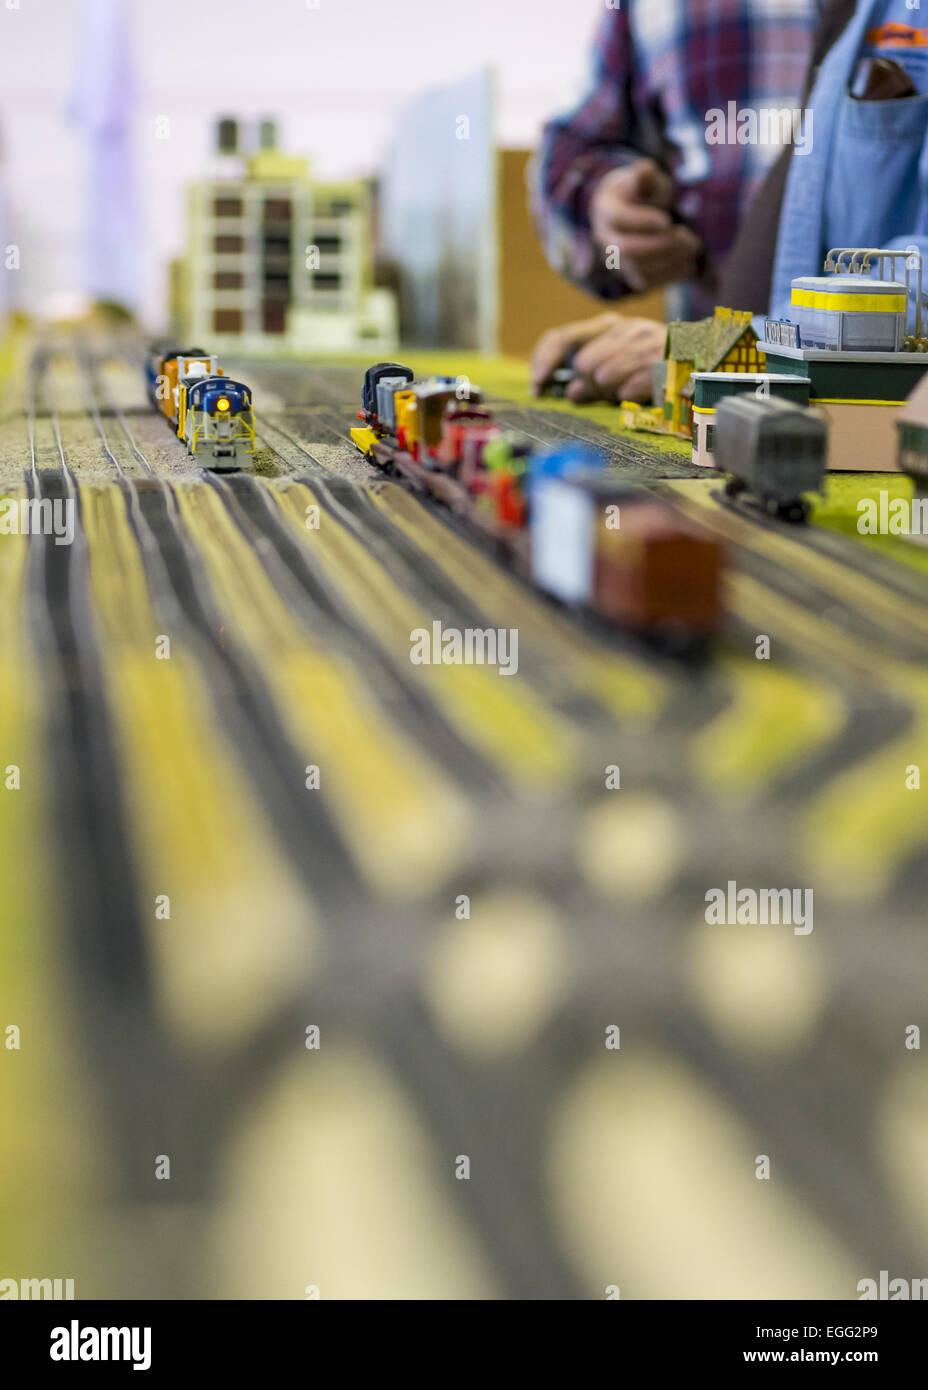 Wunderbar Bester 0 Gauge Draht Bilder - Schaltplan Serie Circuit ...